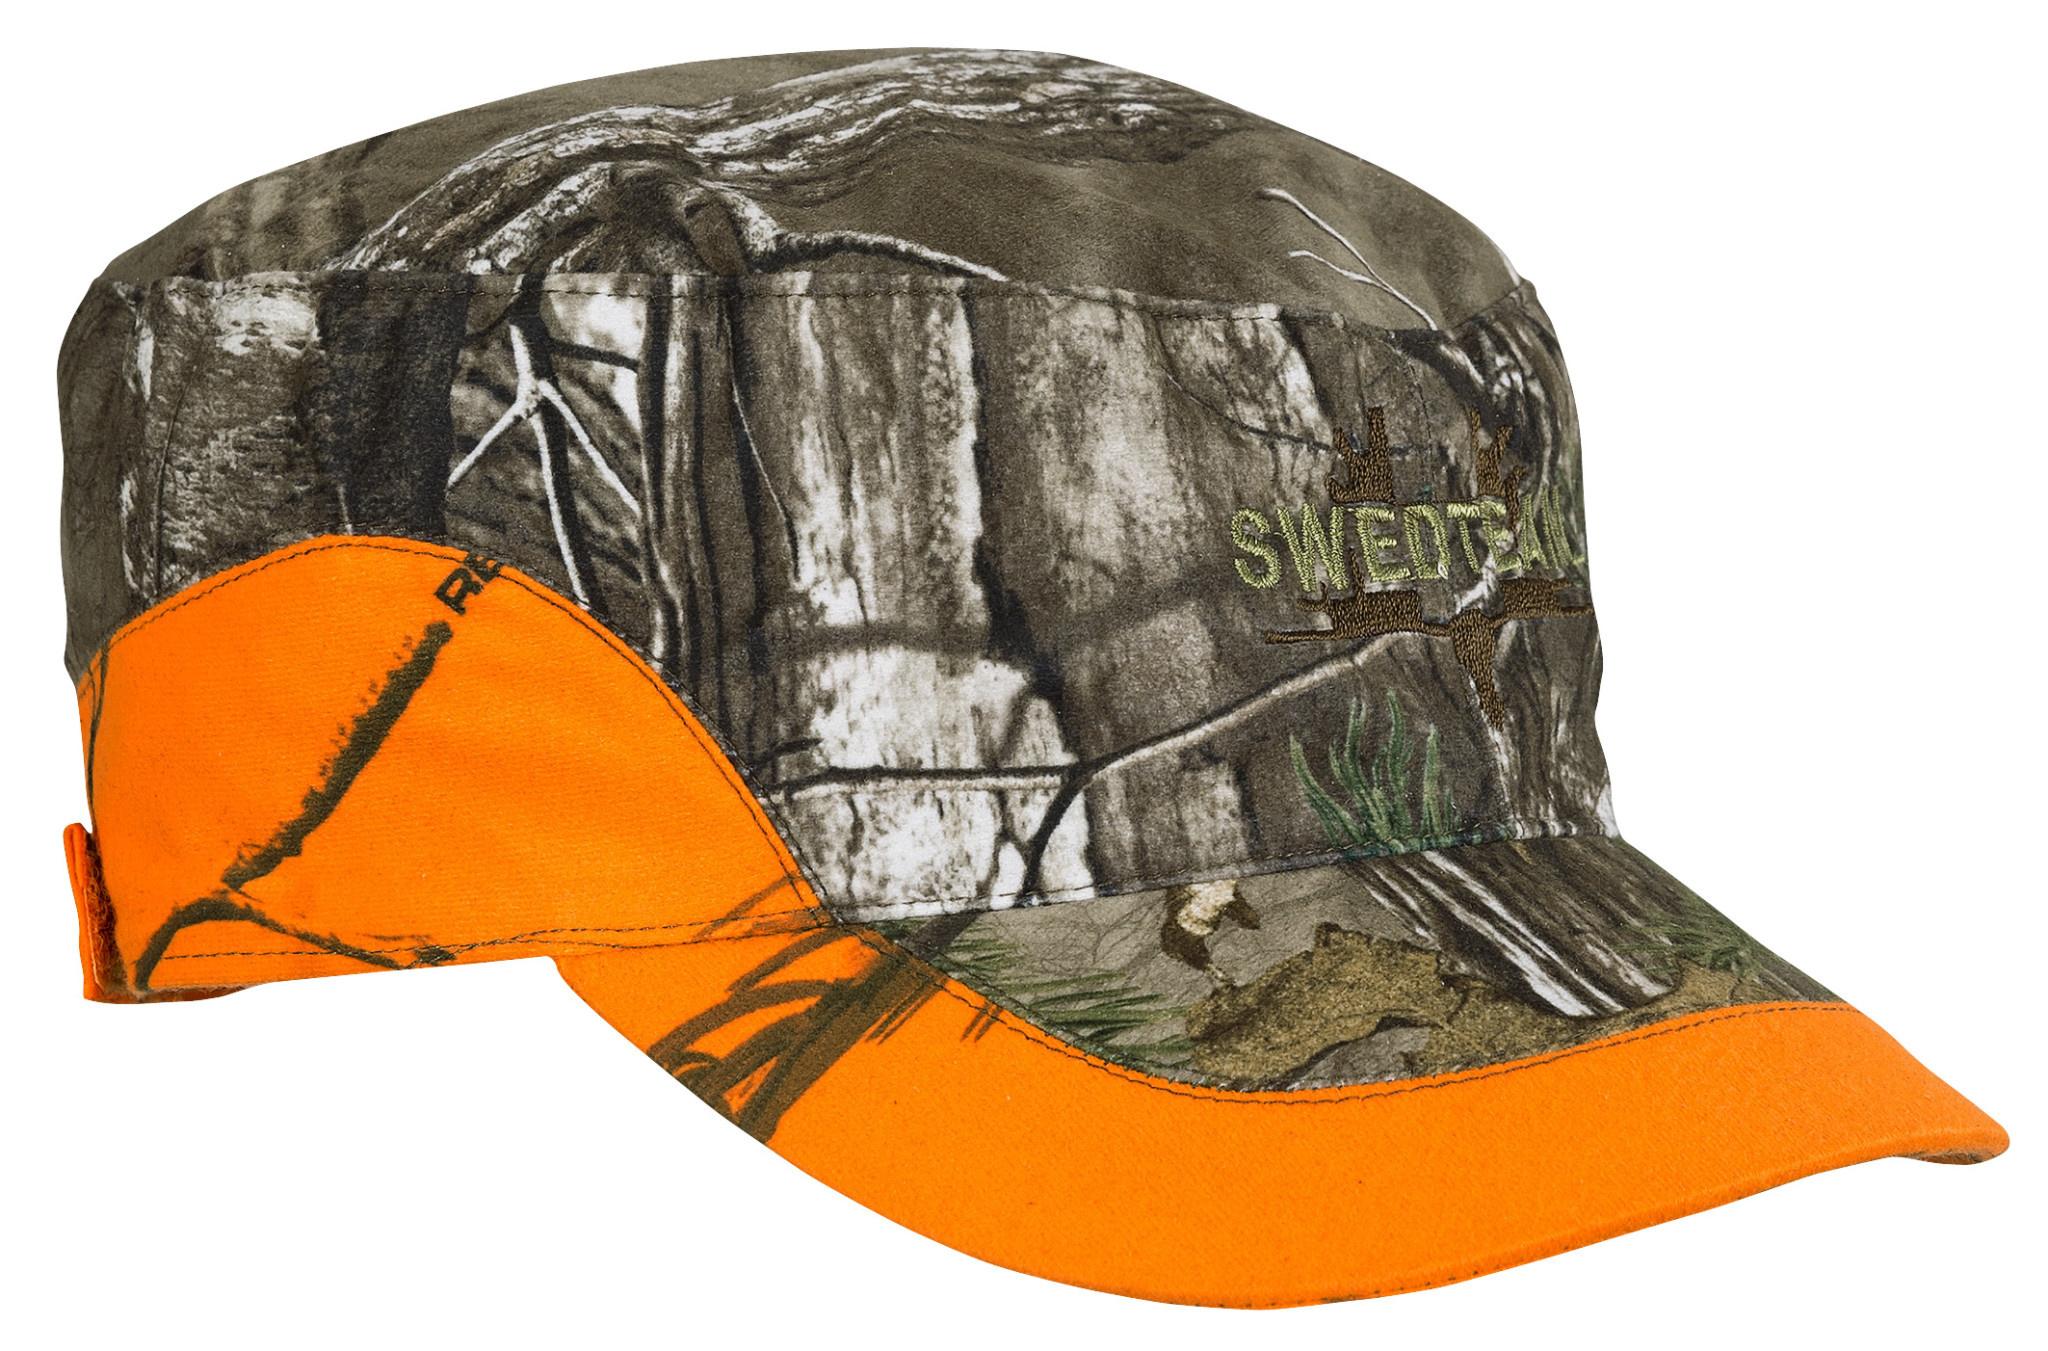 Swedteam Cap Realtree X-TRA® Blaze-1